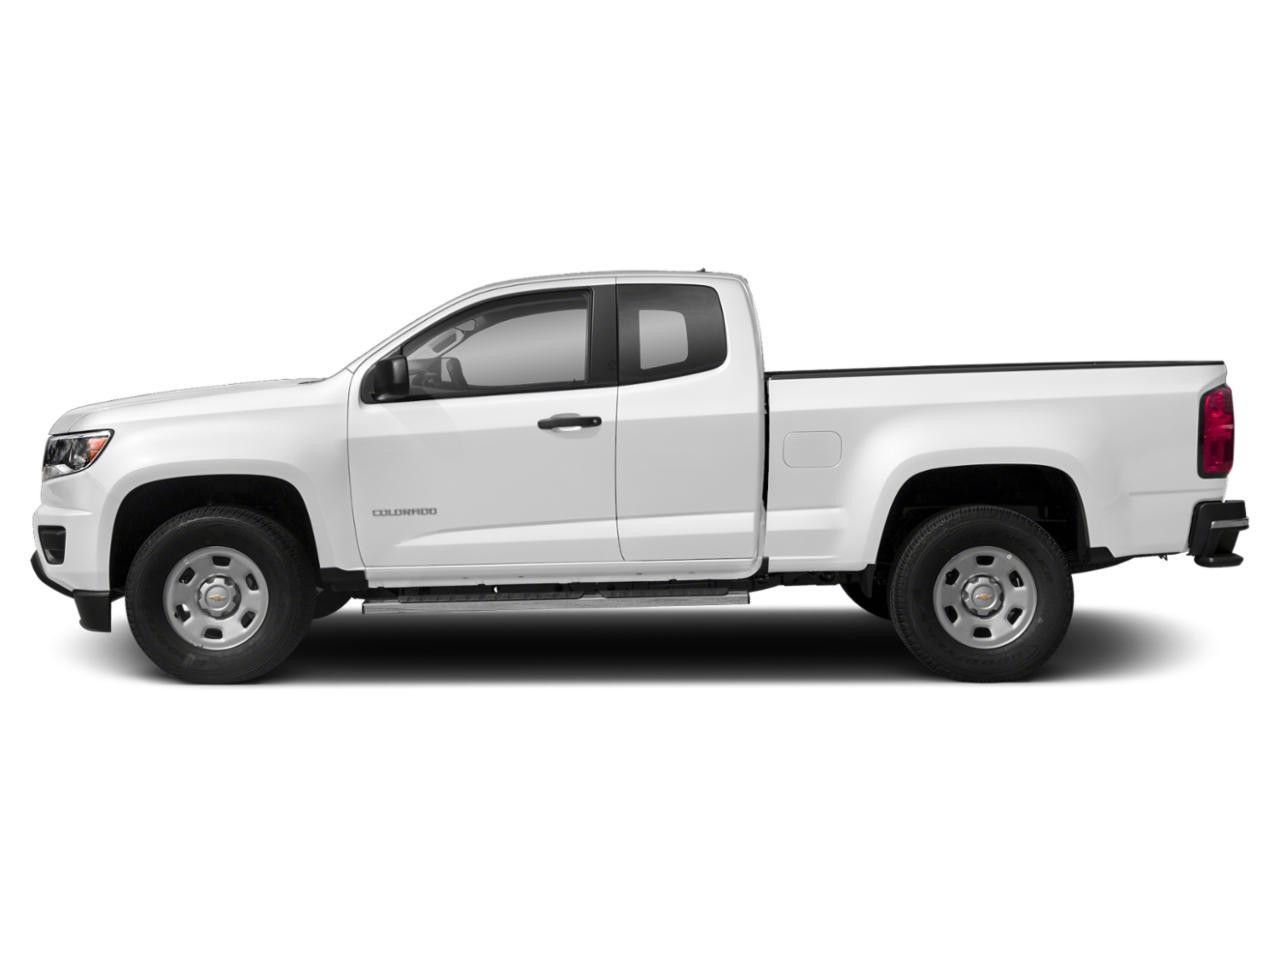 New 2020 Chevrolet Colorado In Phoenix Az L Courtesy Chevrolet 1gchsbea4l1230701